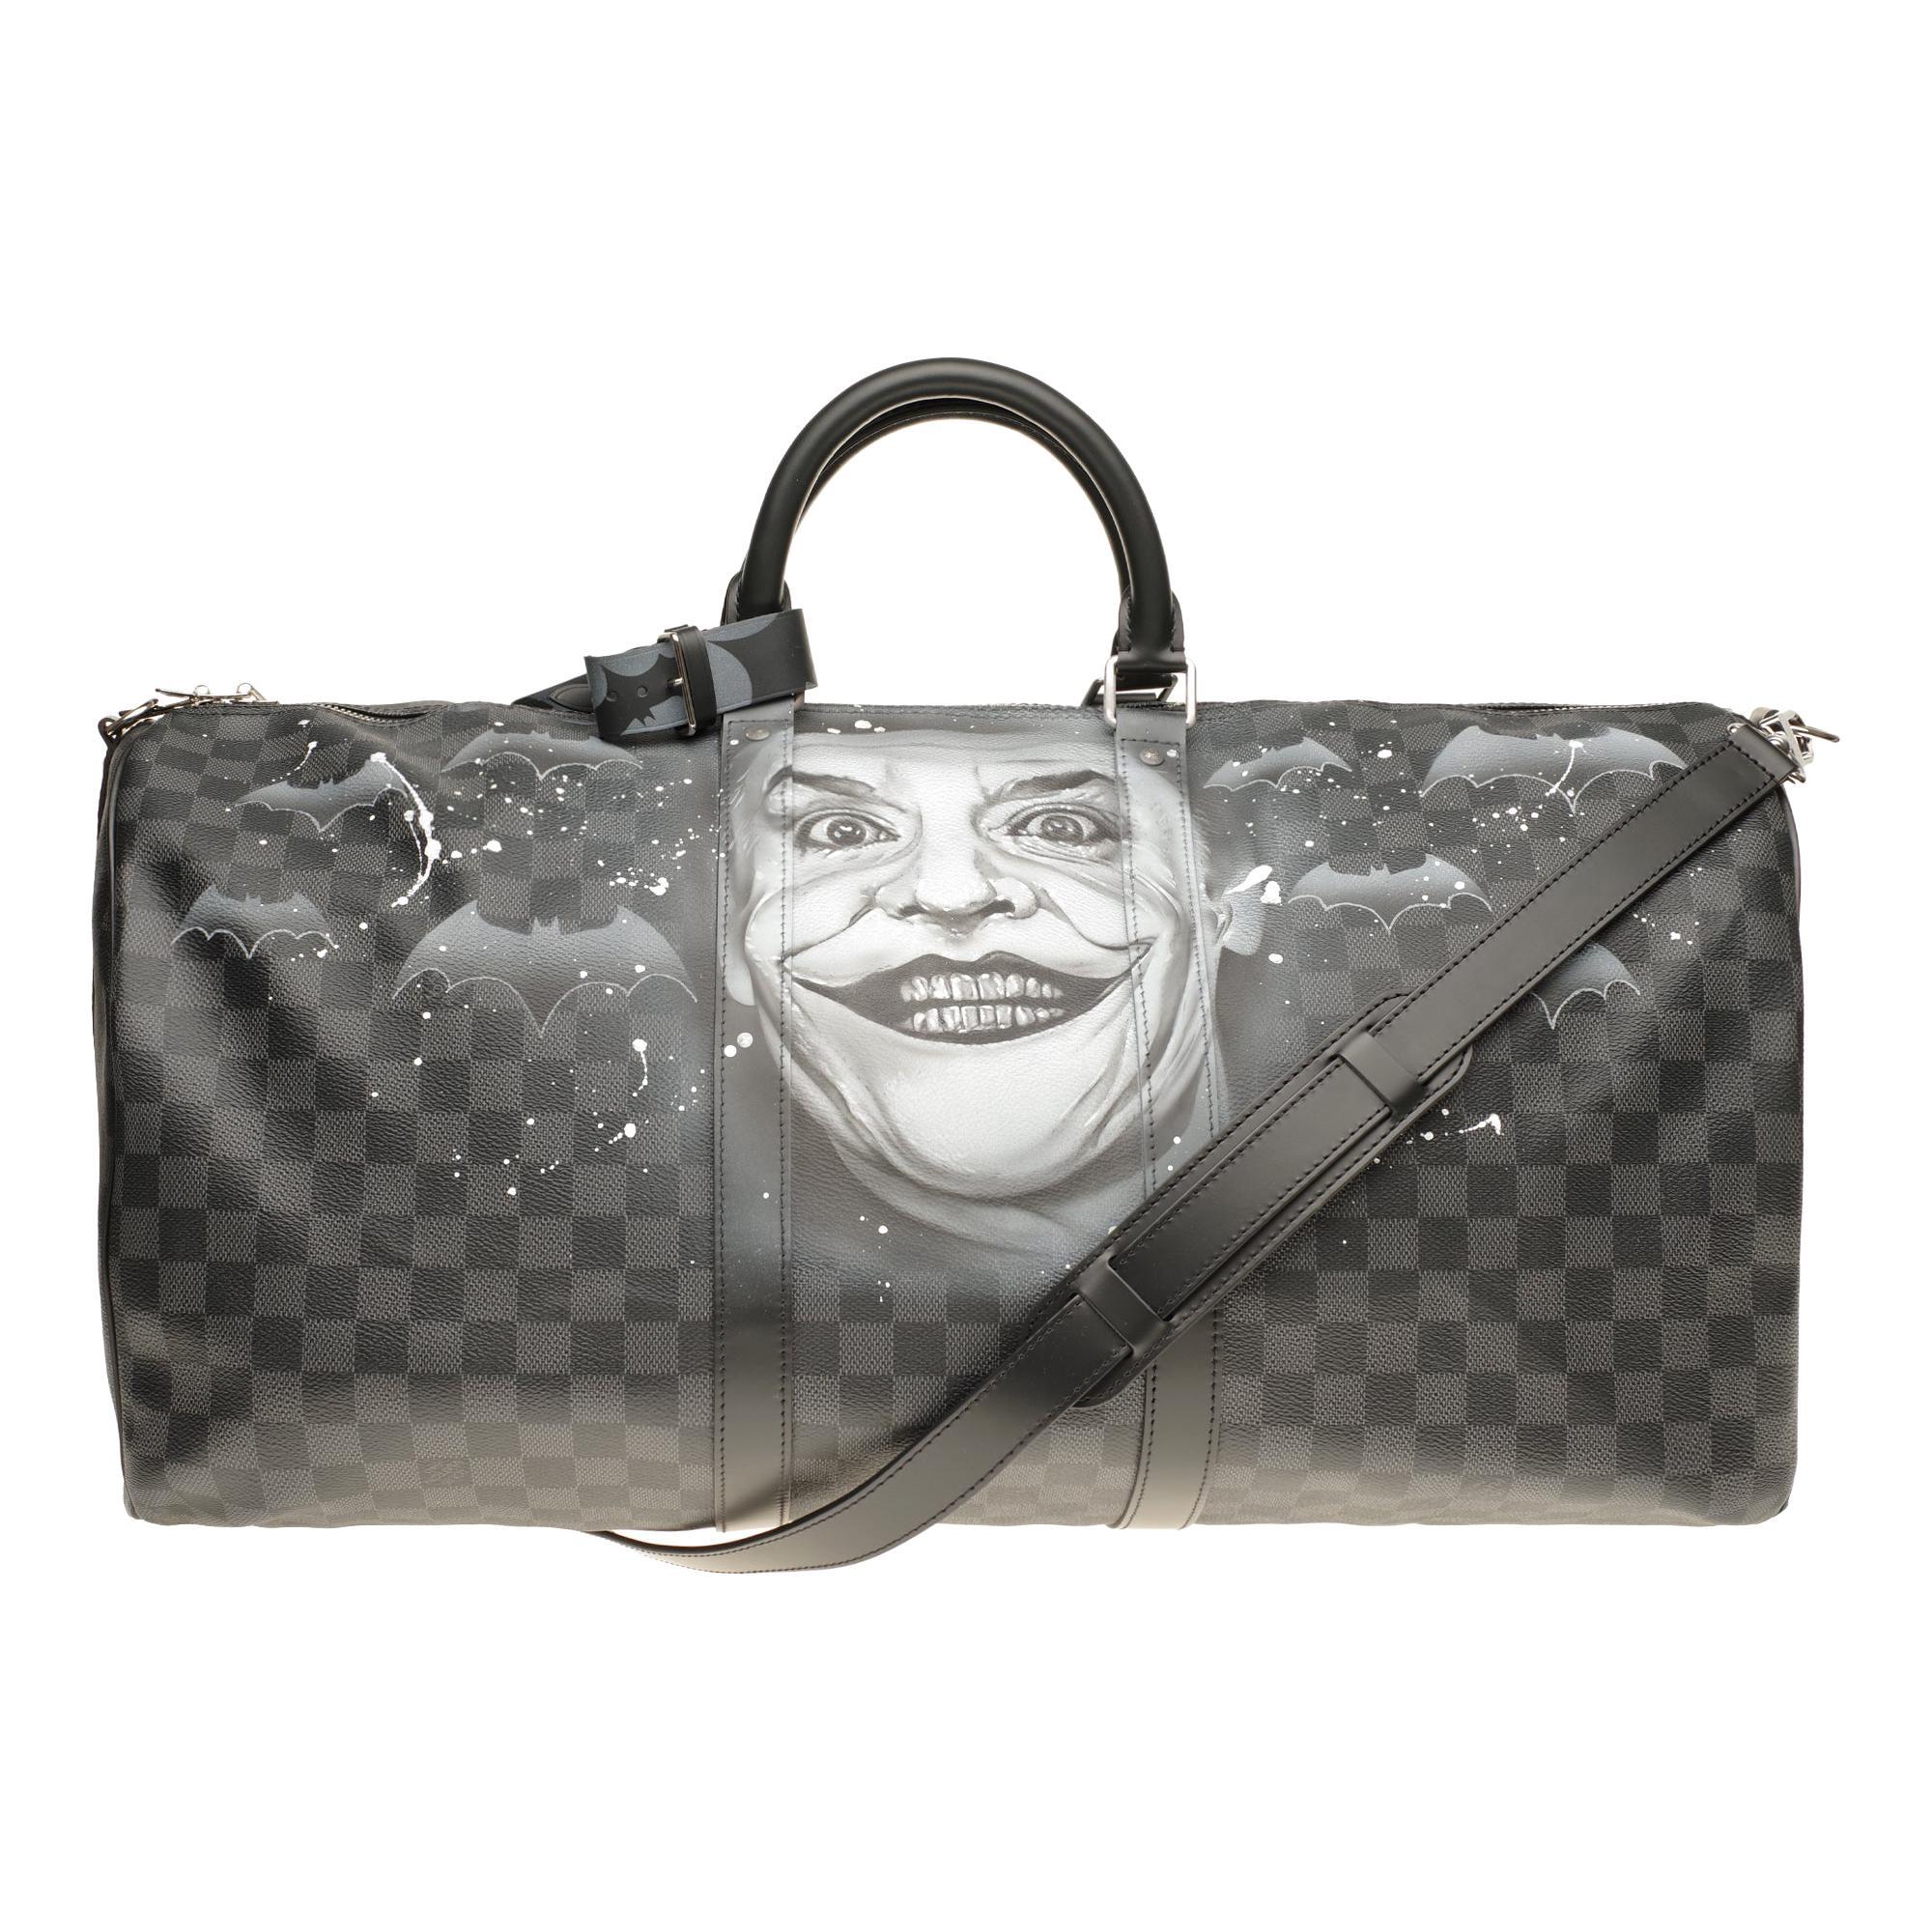 "NEW Louis Vuitton Keepall 55 damier graphite strap customized  ""BATBAG II""!"